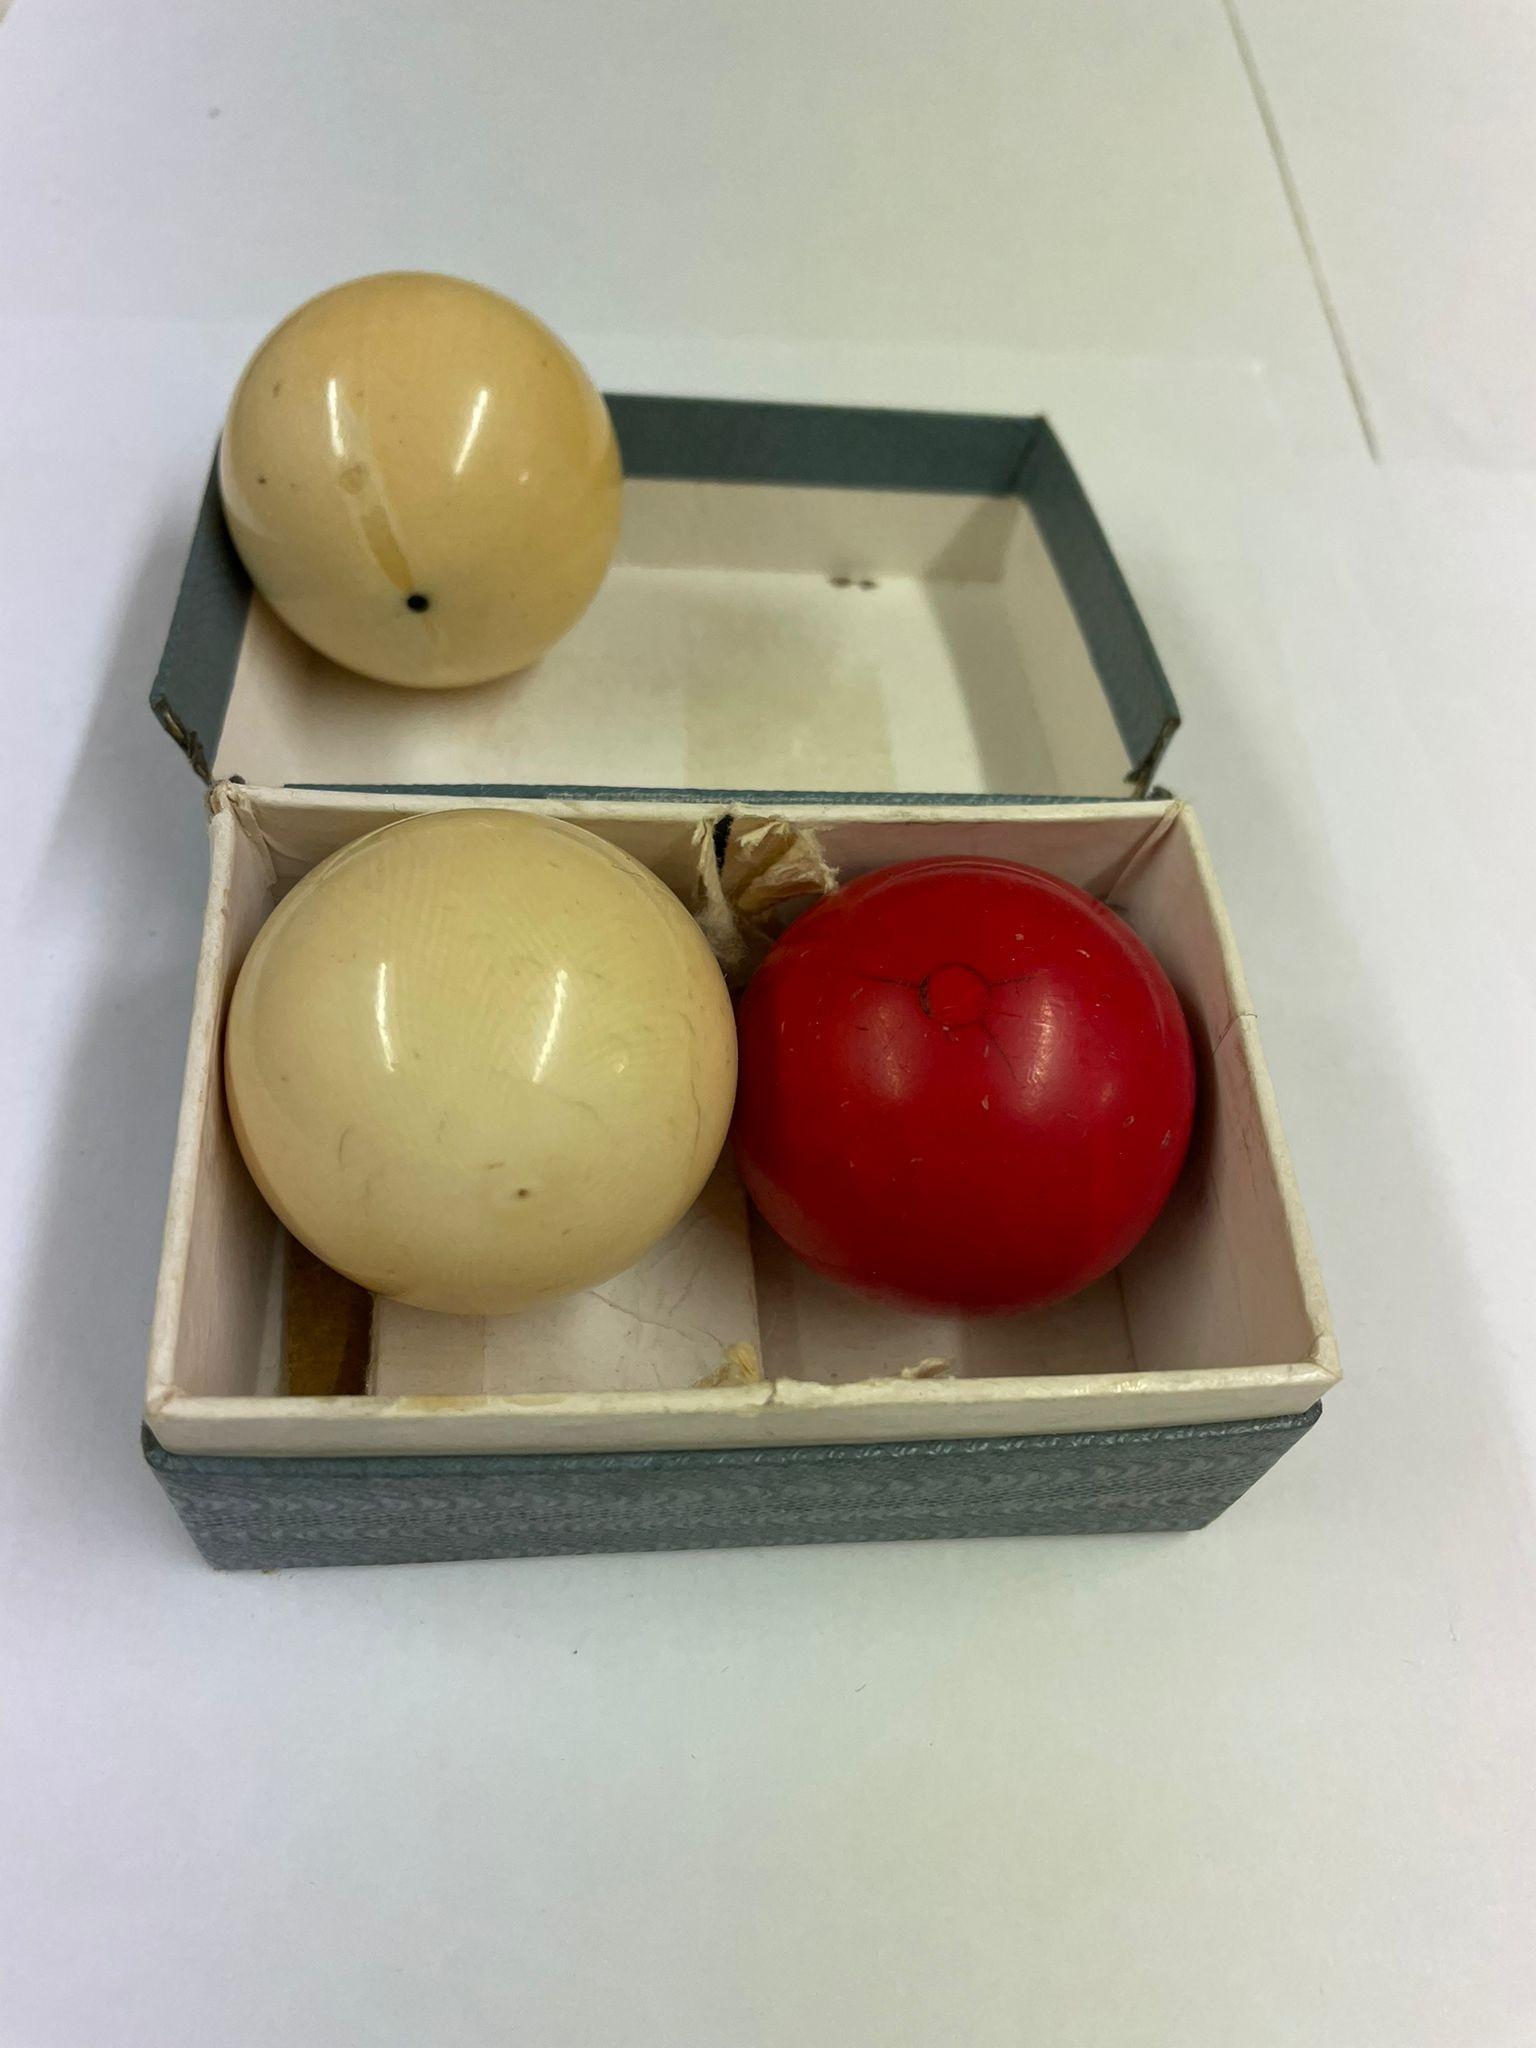 Antique ivory snooker billiard balls x3 - Image 2 of 3